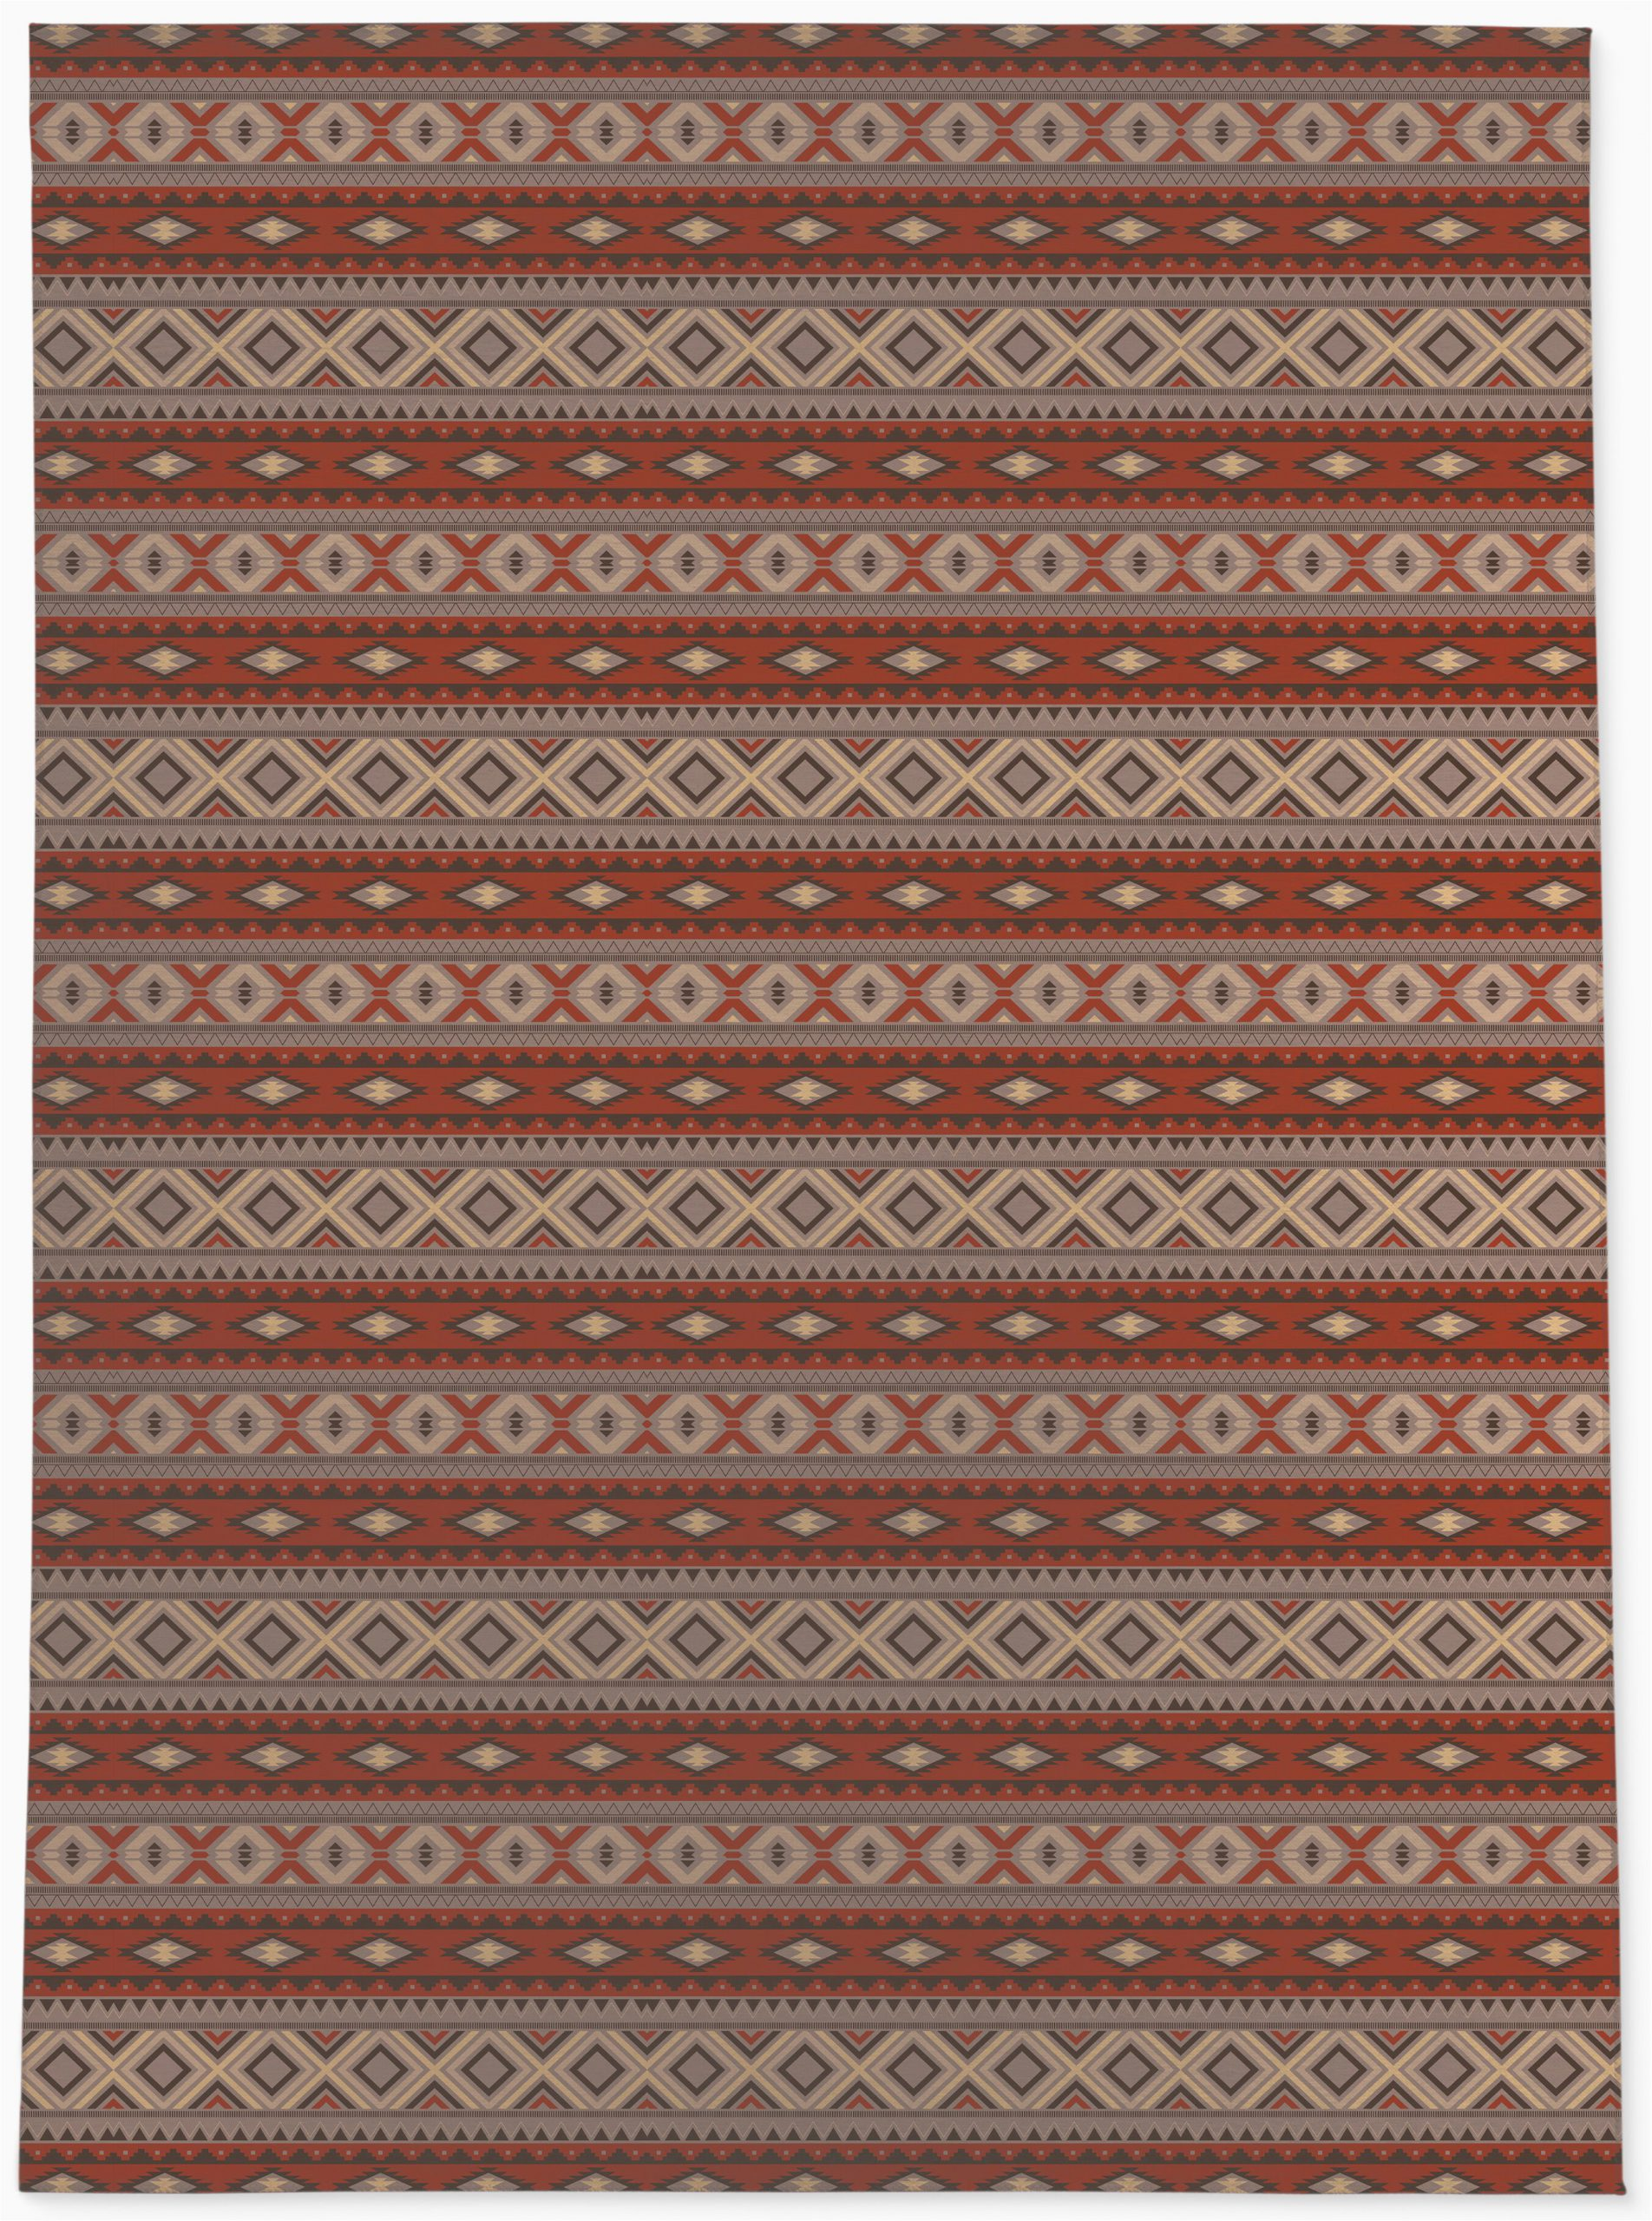 cabarley maroongray rug